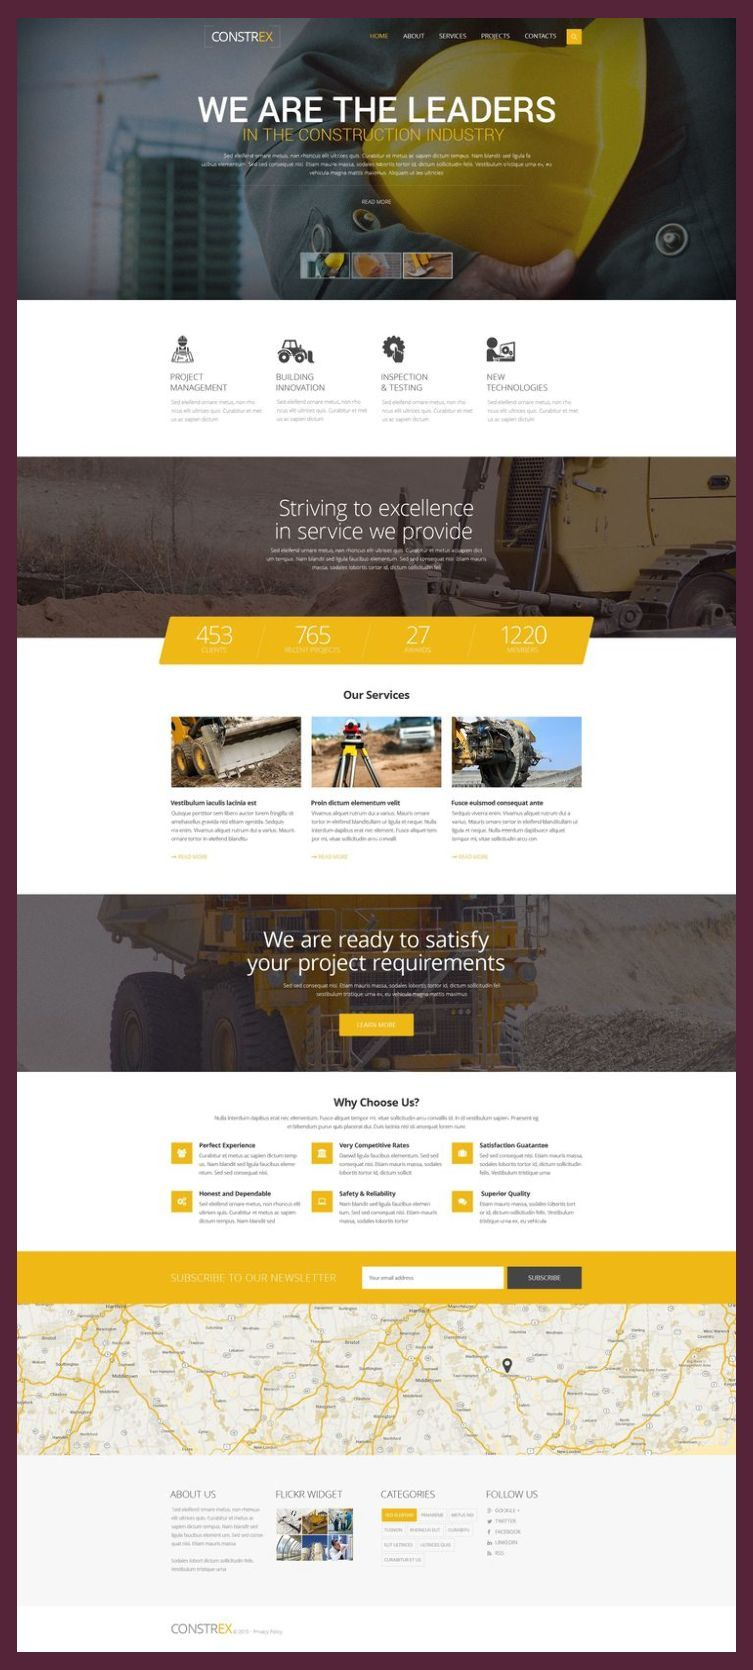 Responsive Web Design Framework Constrex Website Template 55226 Responsive Web Design L Web Design Tips Simple Web Design Web Layout Design